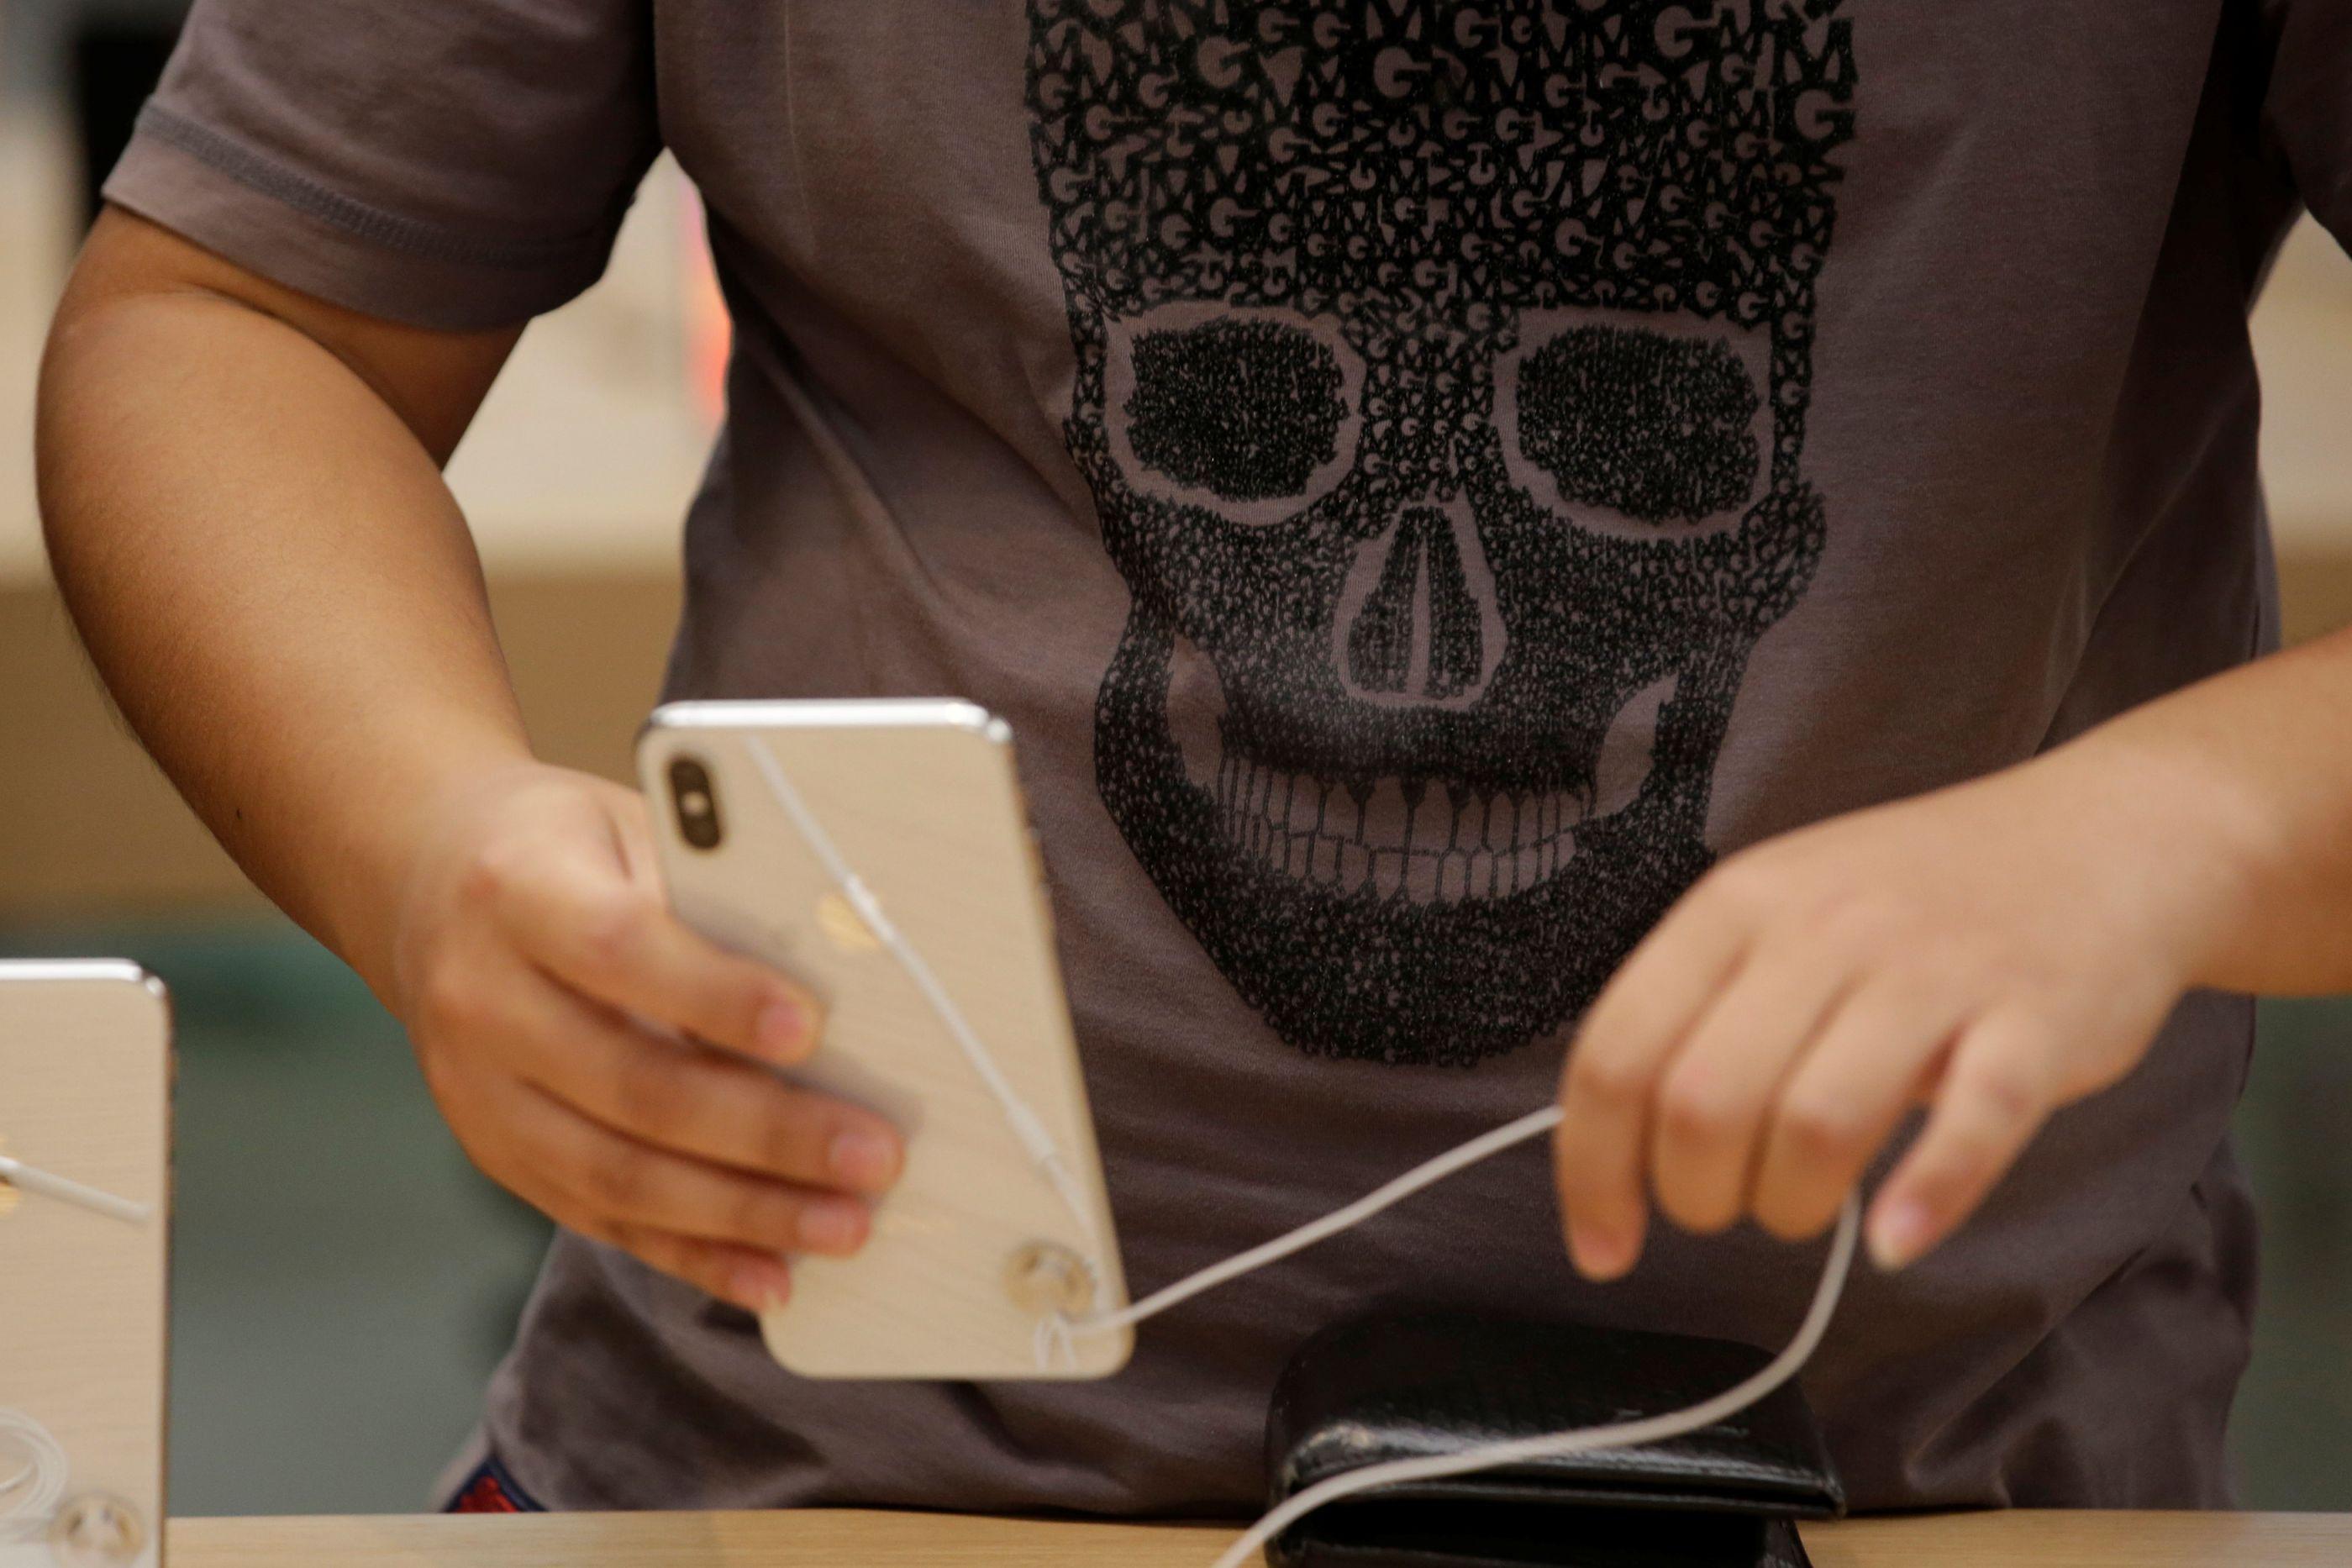 5G da Apple pode chegar em 2020